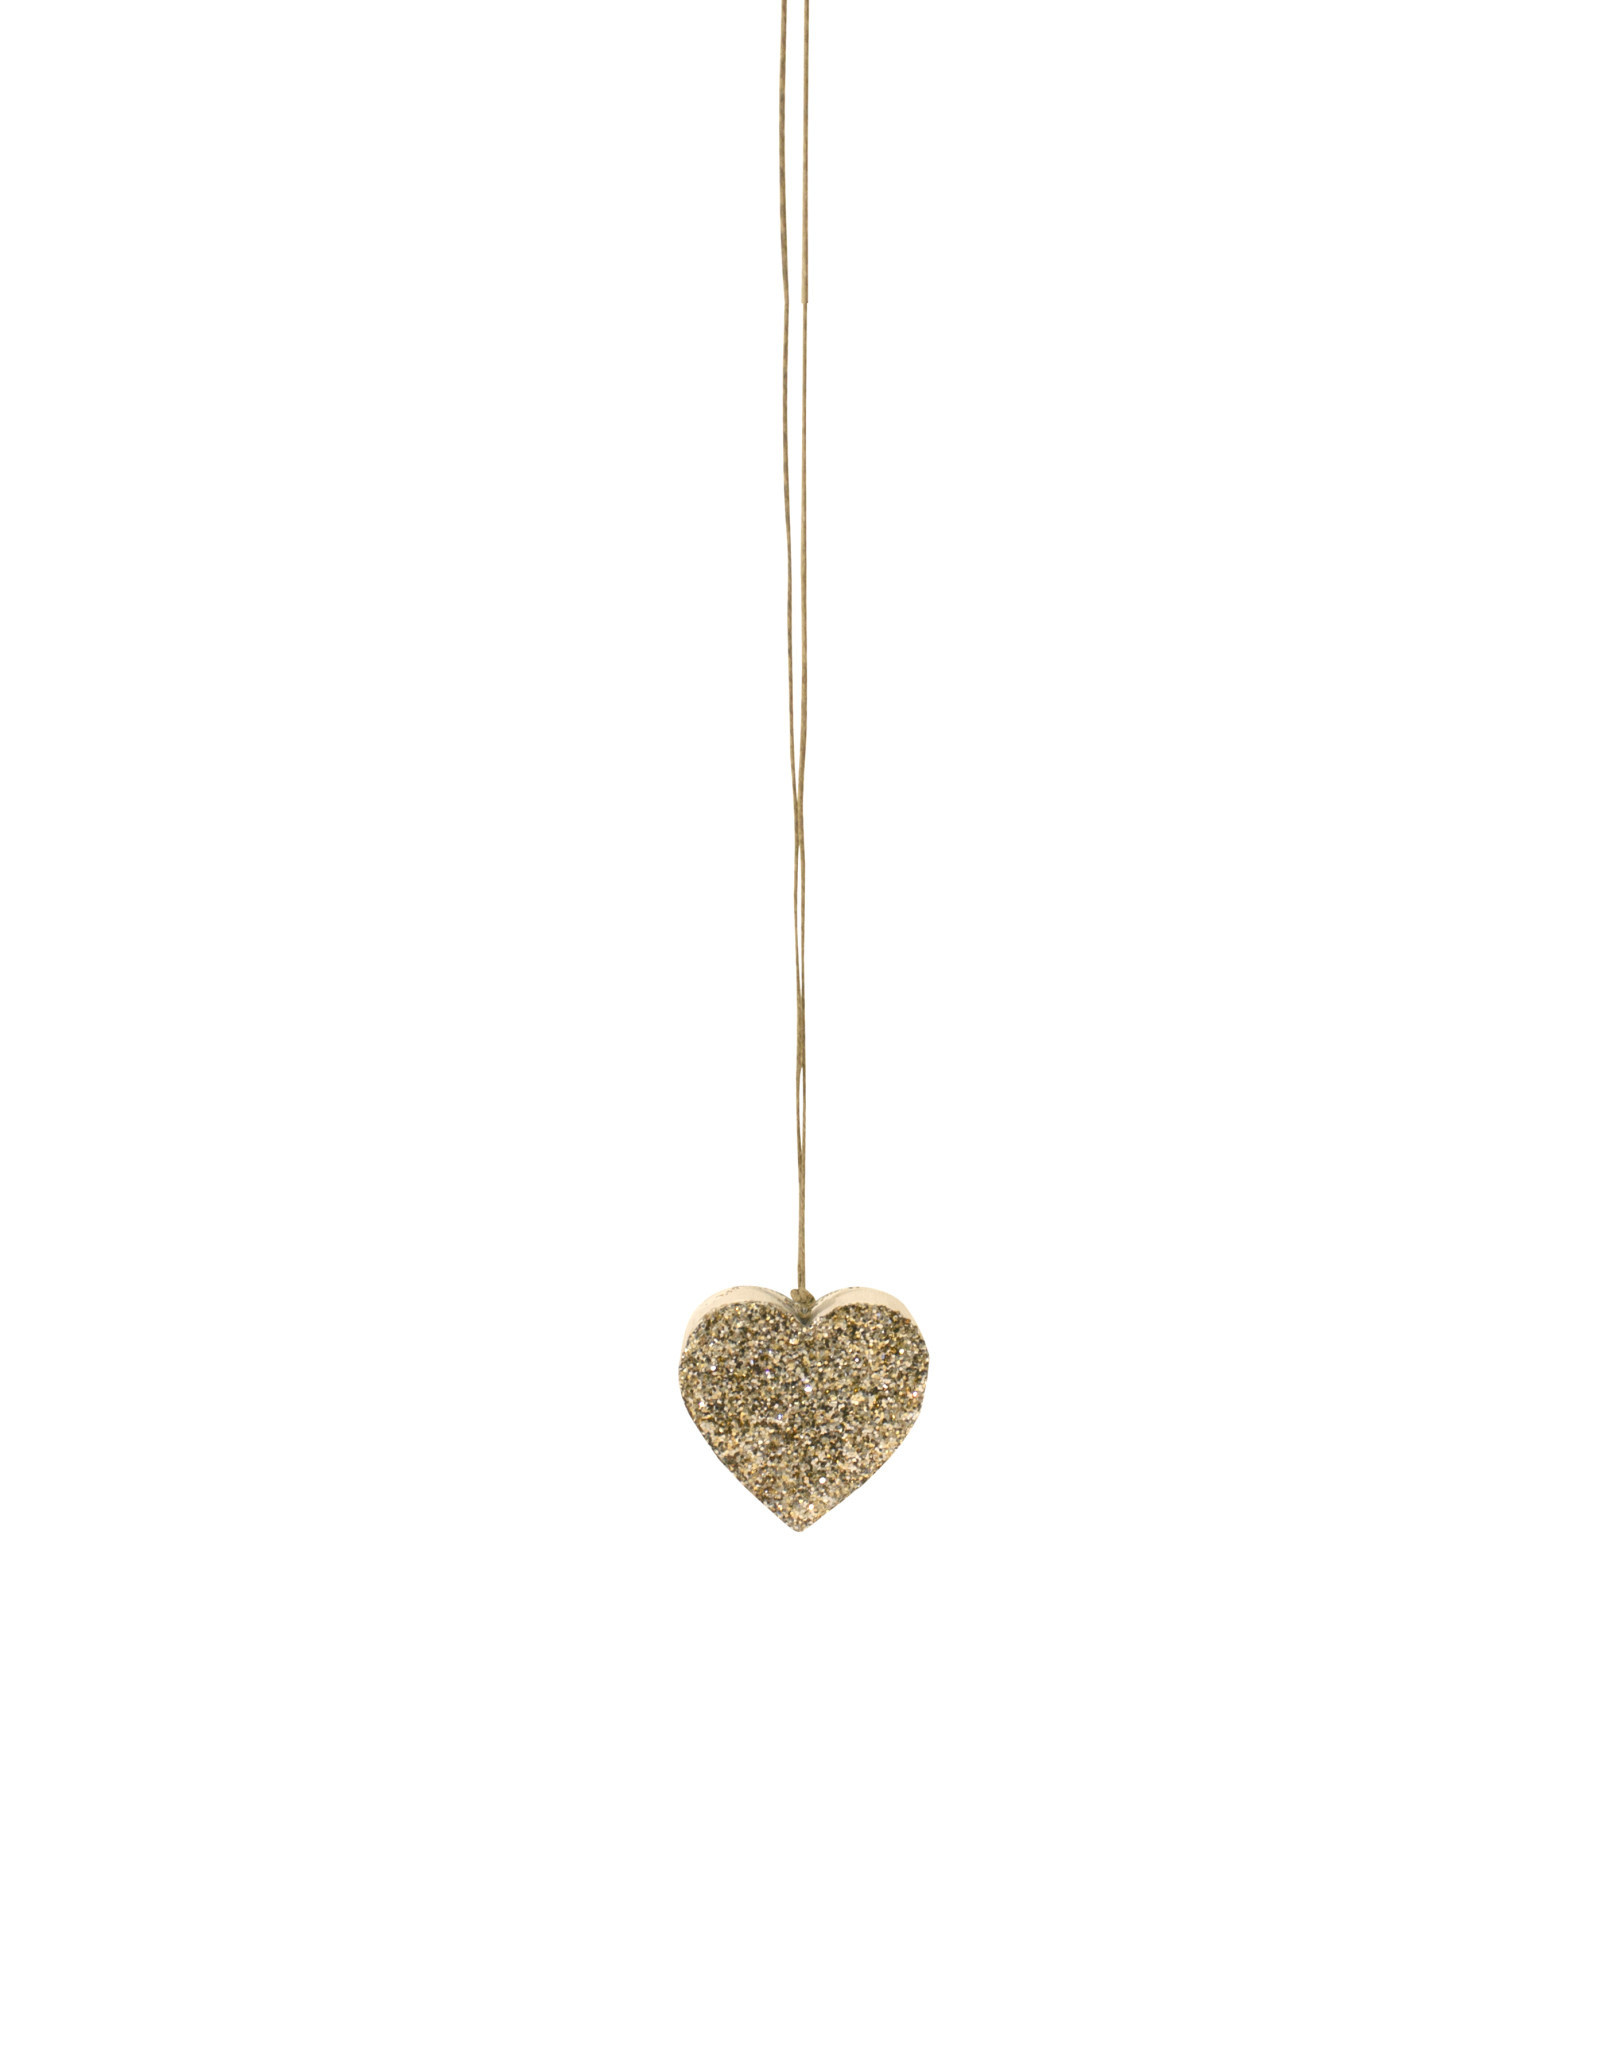 Entouquet Champagne Glitter Extra Small Heart on Hemp